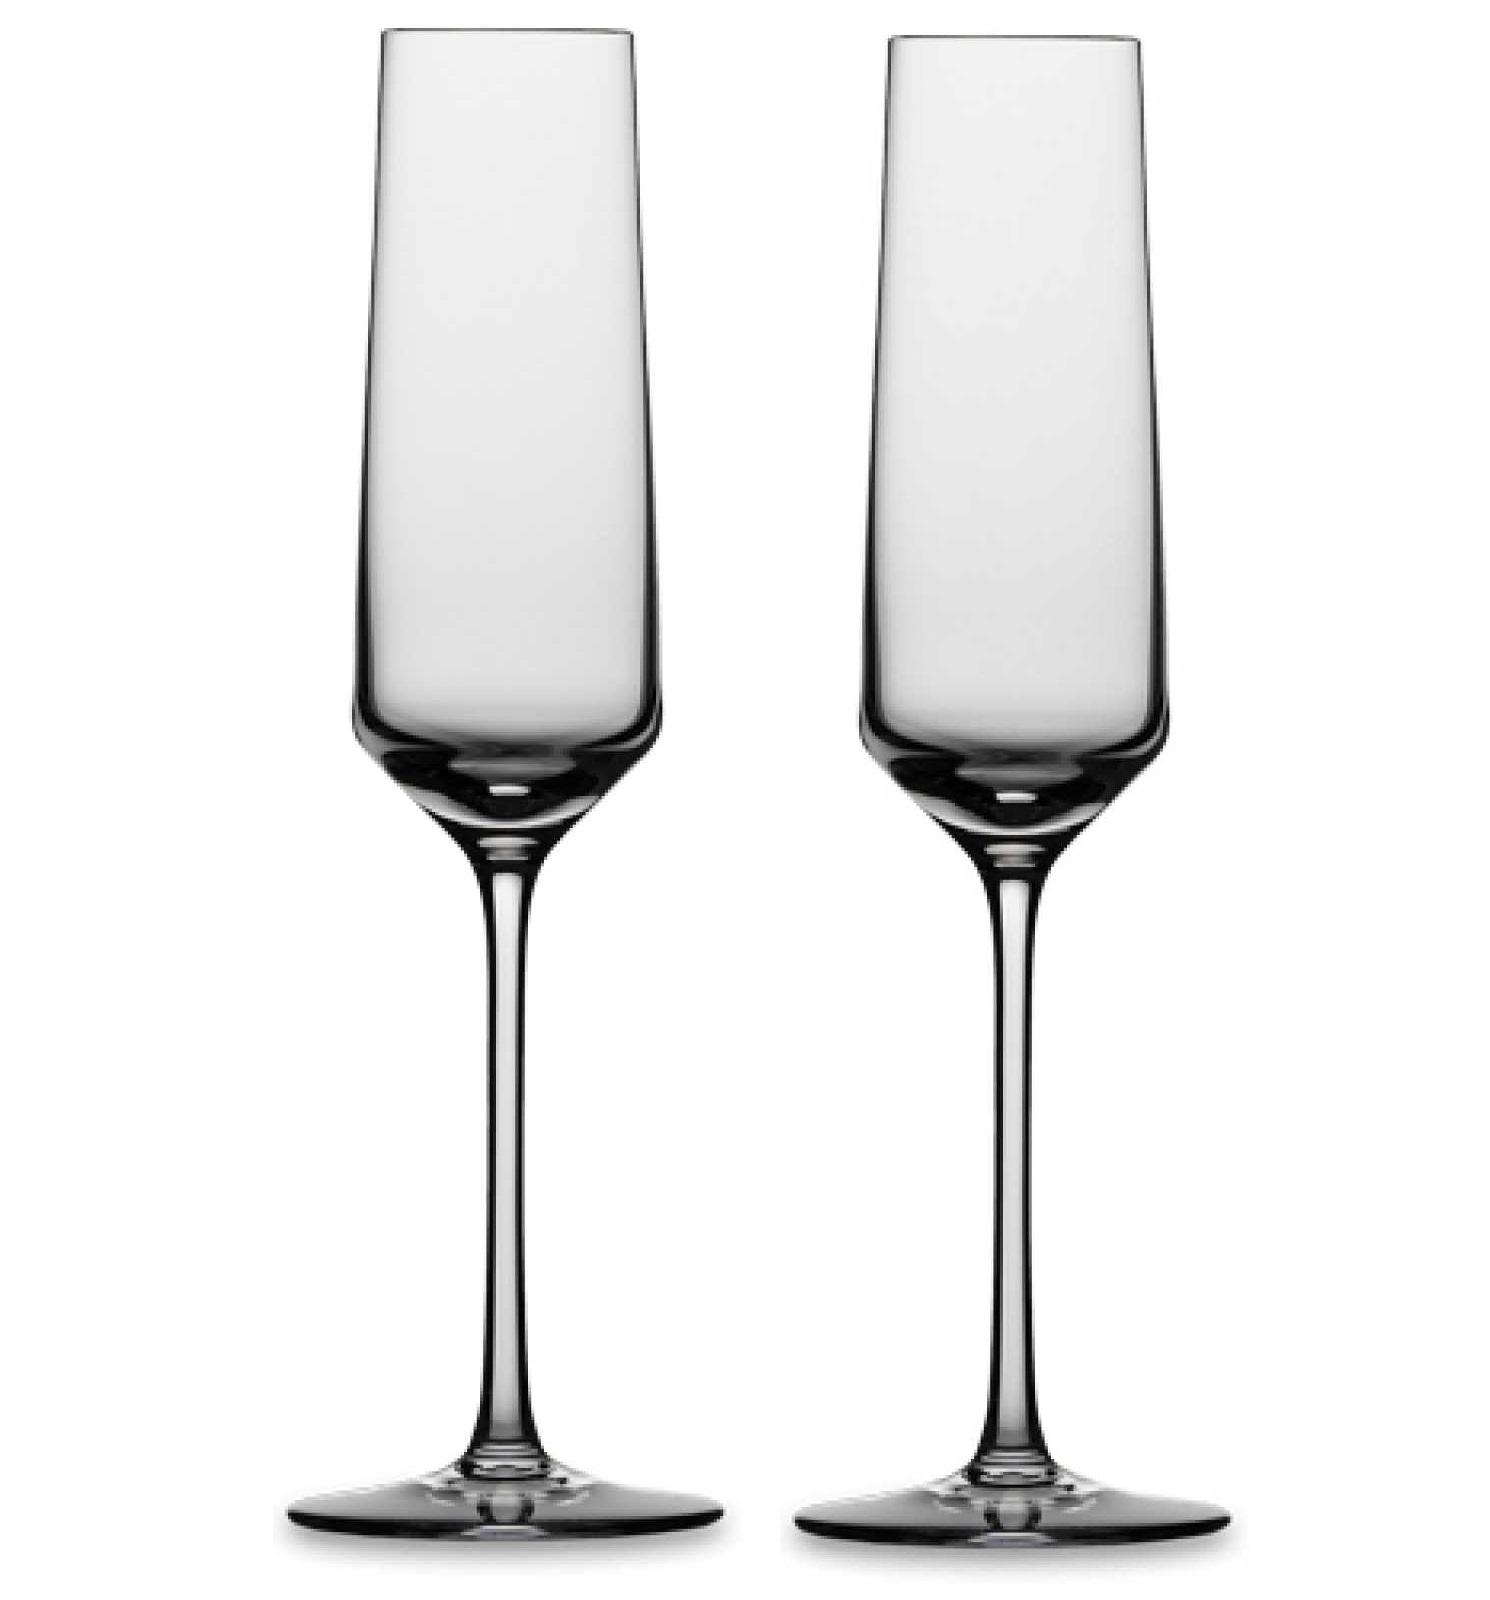 Онлайн каталог PROMENU: Набор бокалов для шампанского Schott Zwiesel PURE, прозрачный, 2 штуки Schott Zwiesel 112941_PROMO